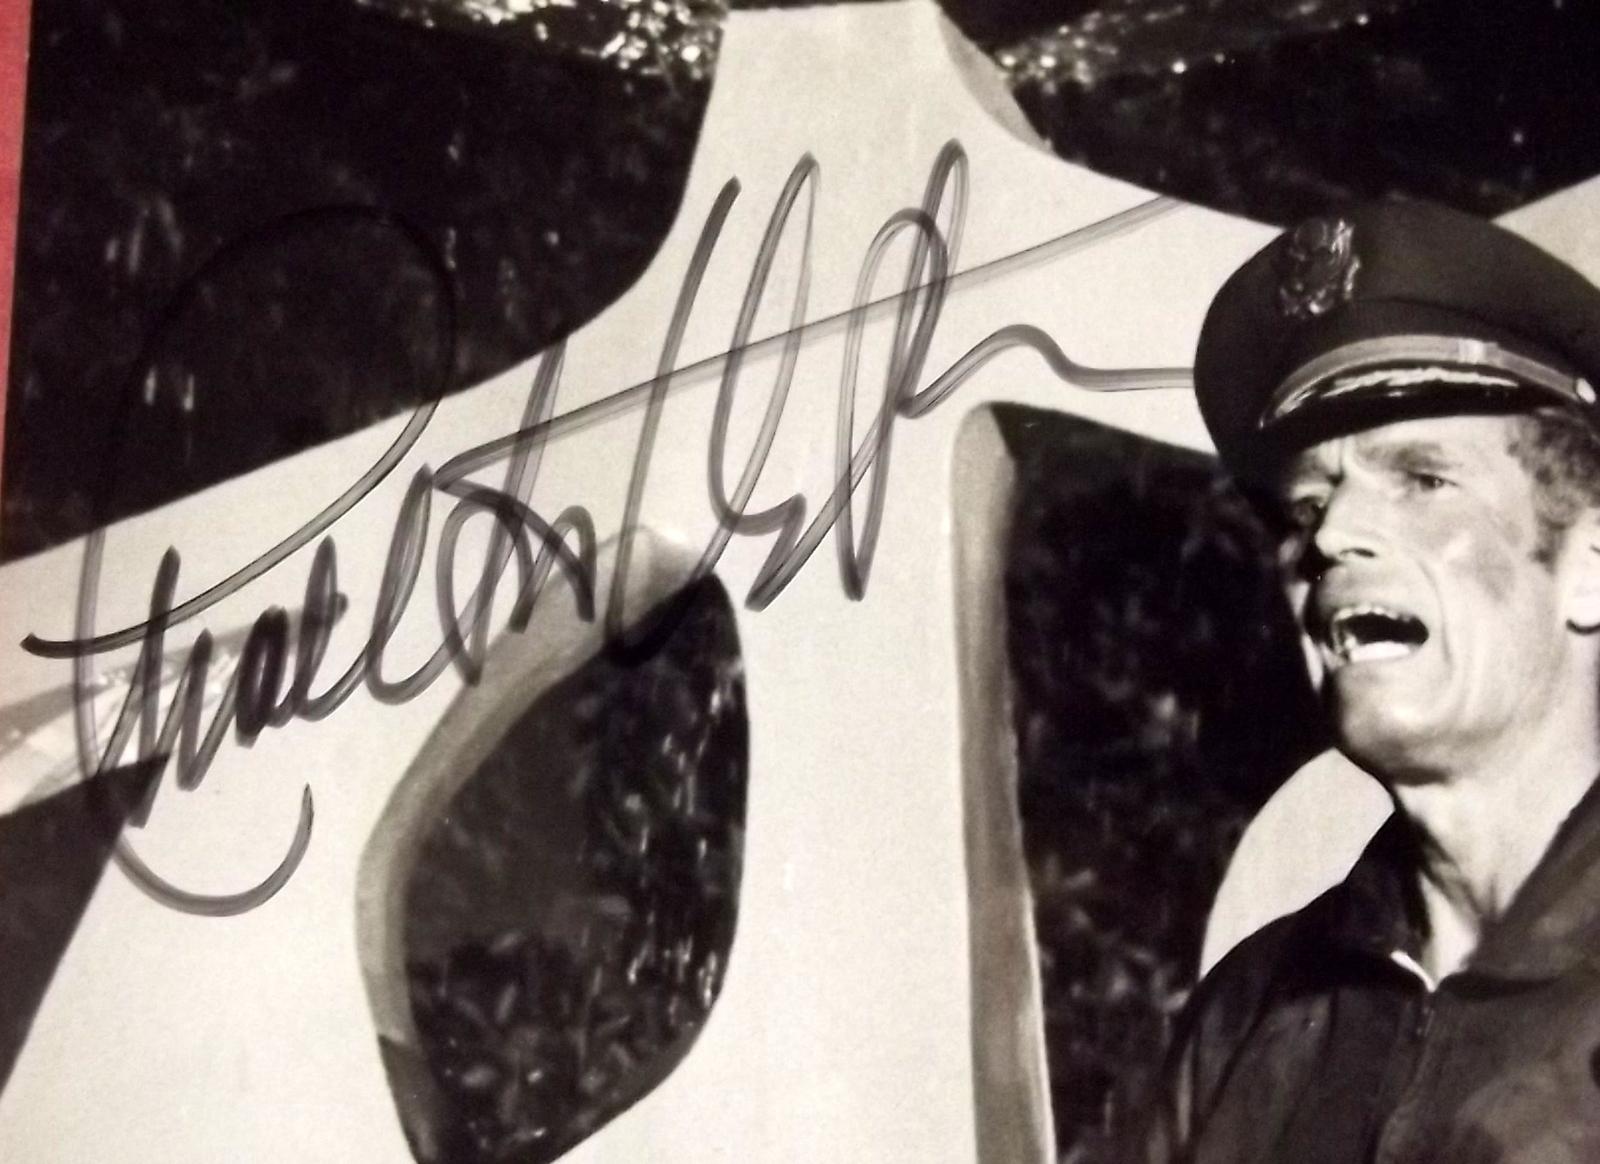 CHARLTON HESTON (THE OMEGA MAN) ORIGINAL AUTOGRAPH PHOTO (CLASSIC CULT SCI-FI) W